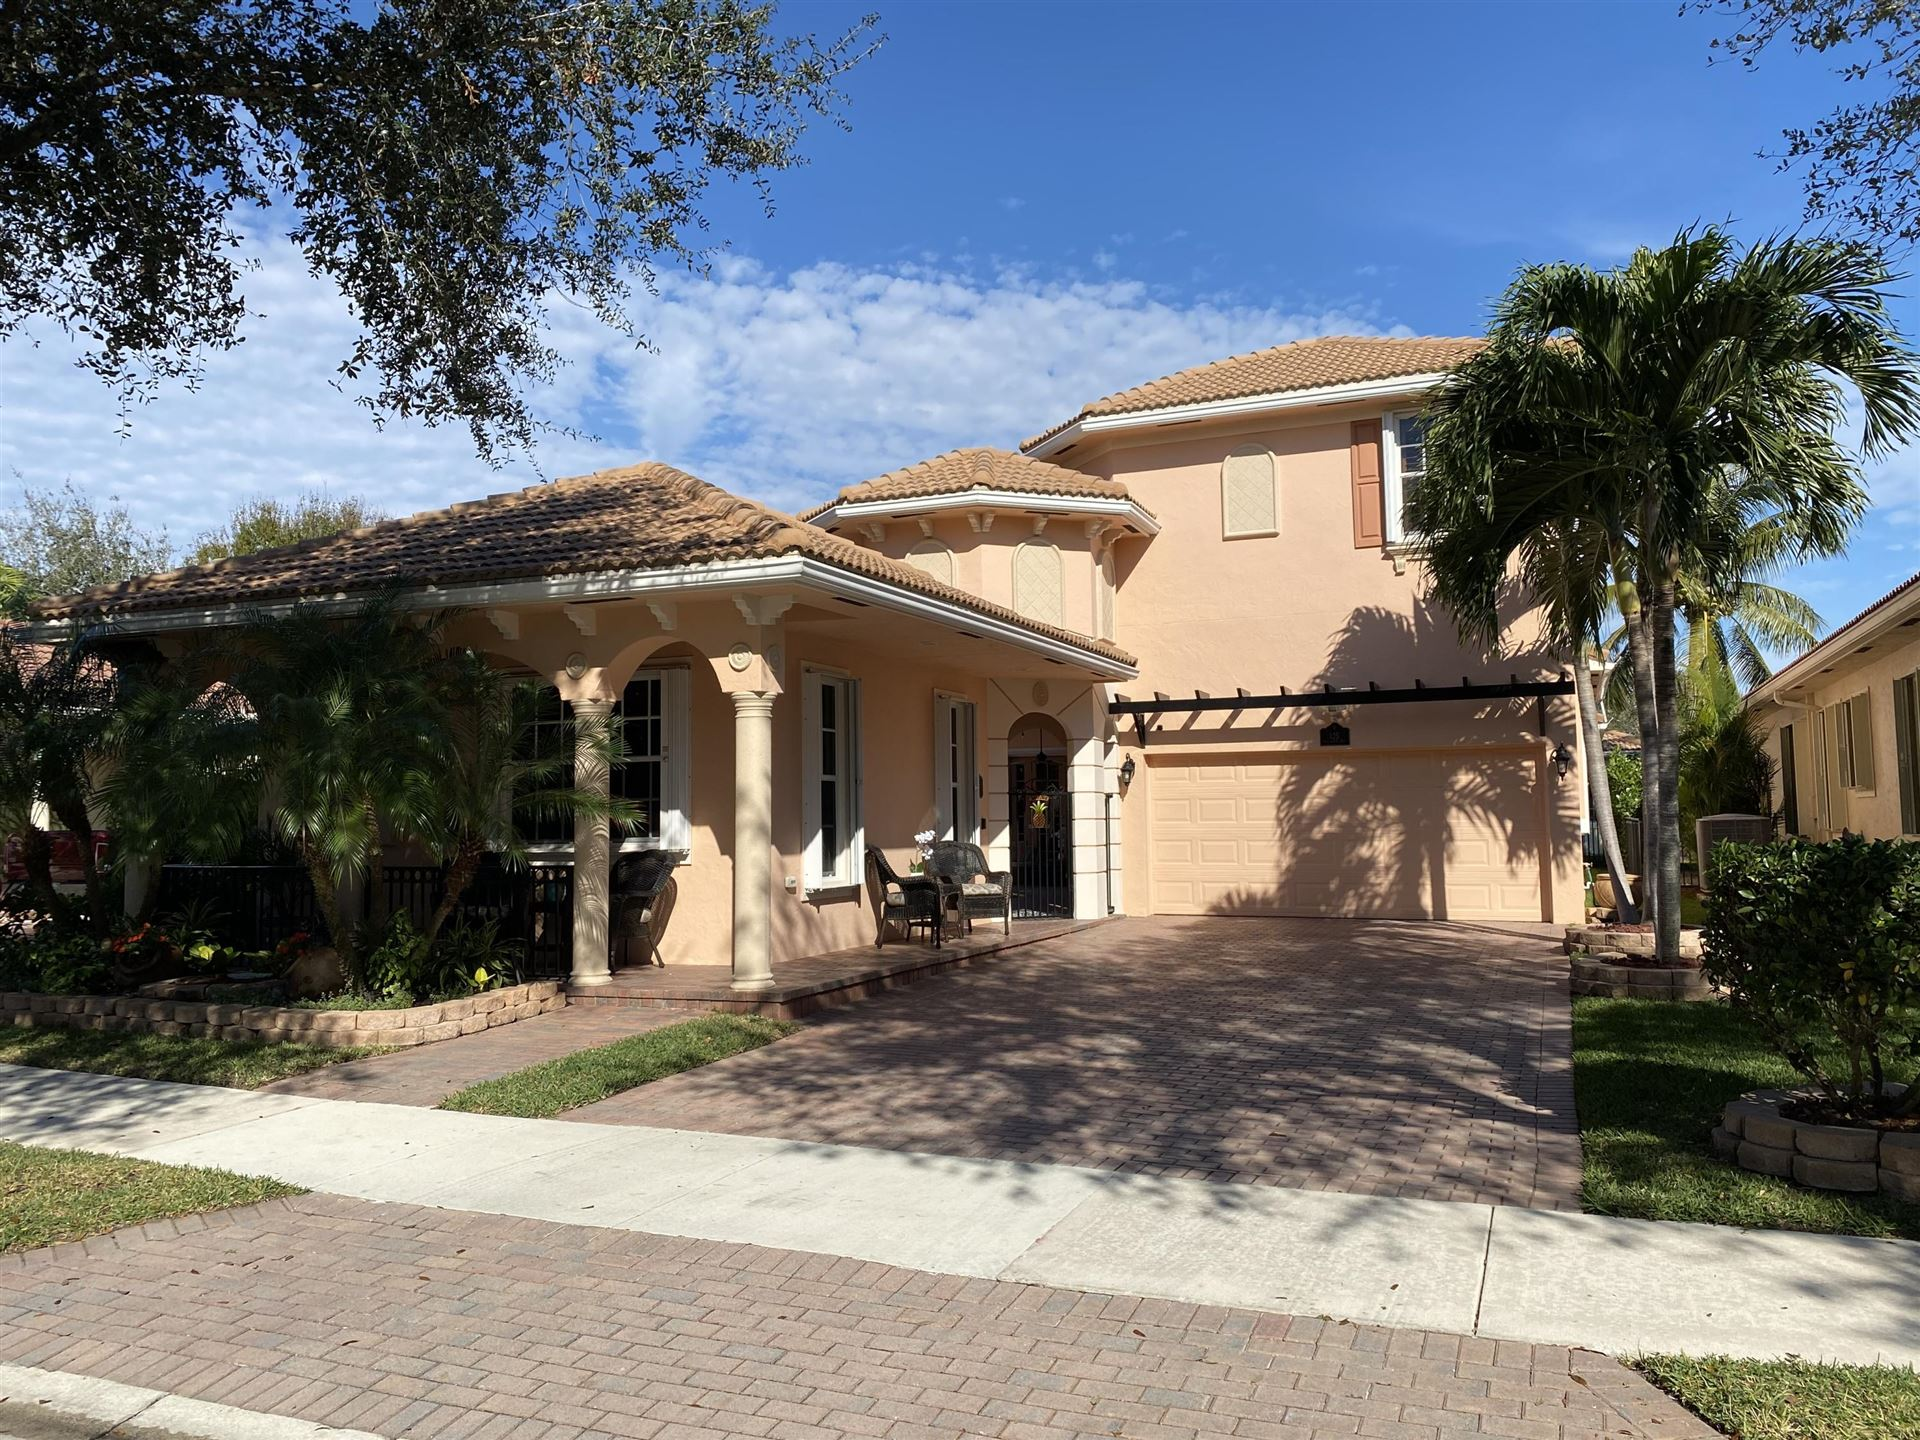 Photo of 125 Via Santa Cruz, Jupiter, FL 33458 (MLS # RX-10684184)